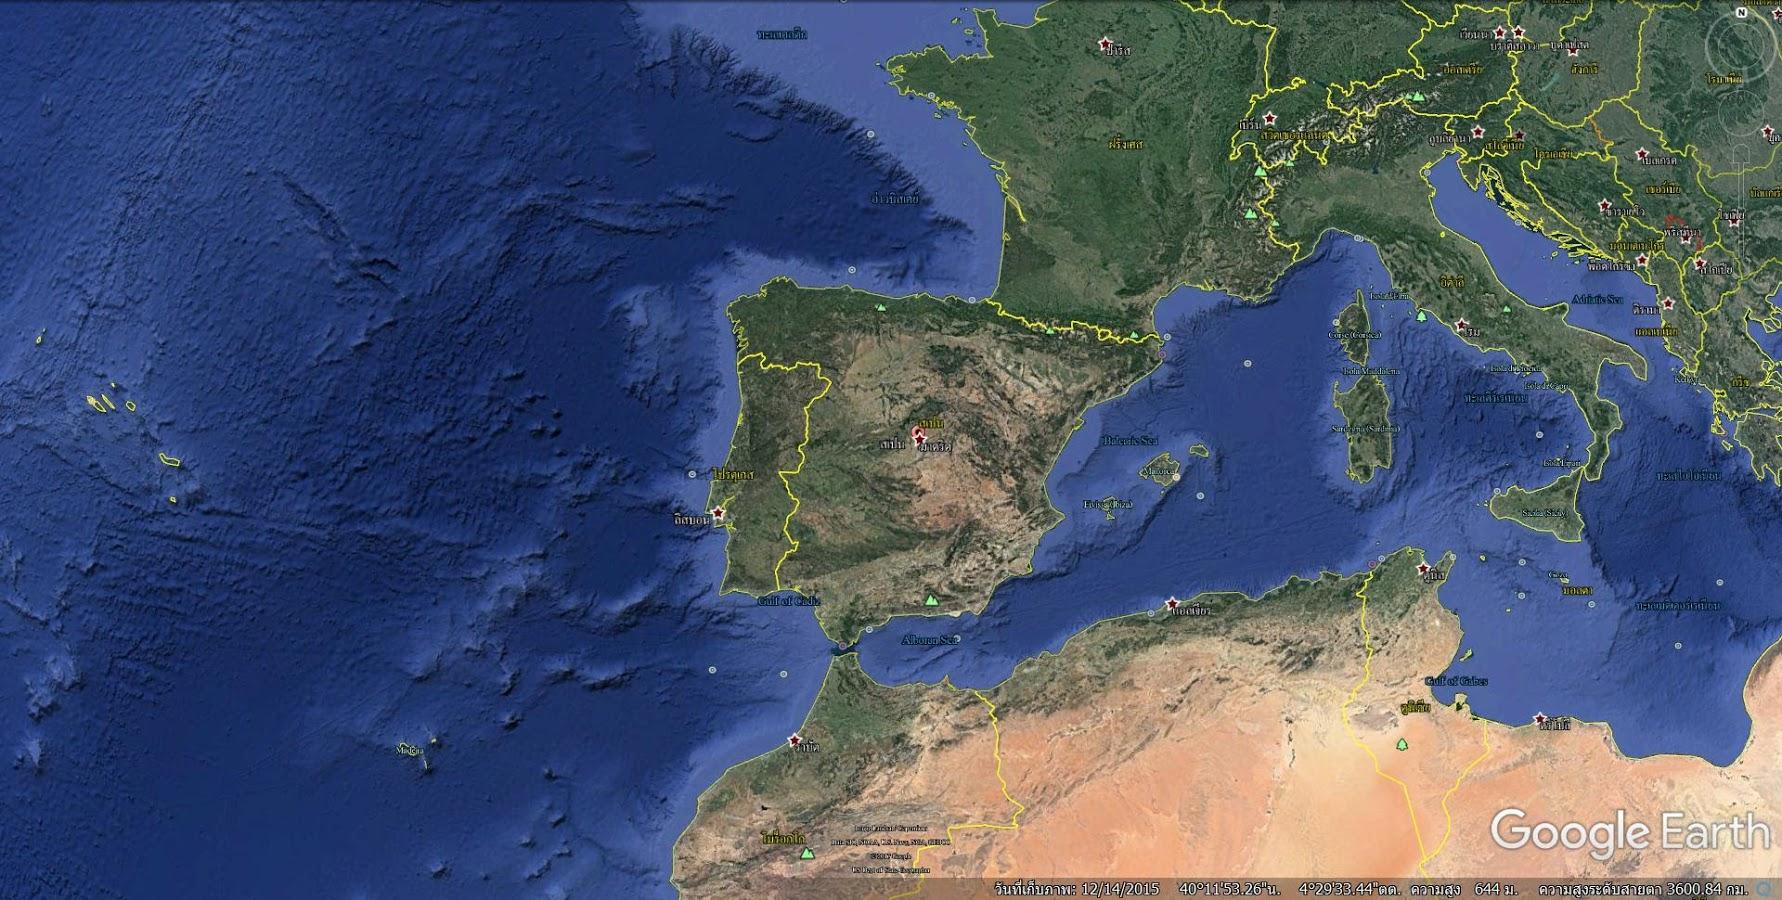 Google Earth Map Of Spain.Google Earth Europe